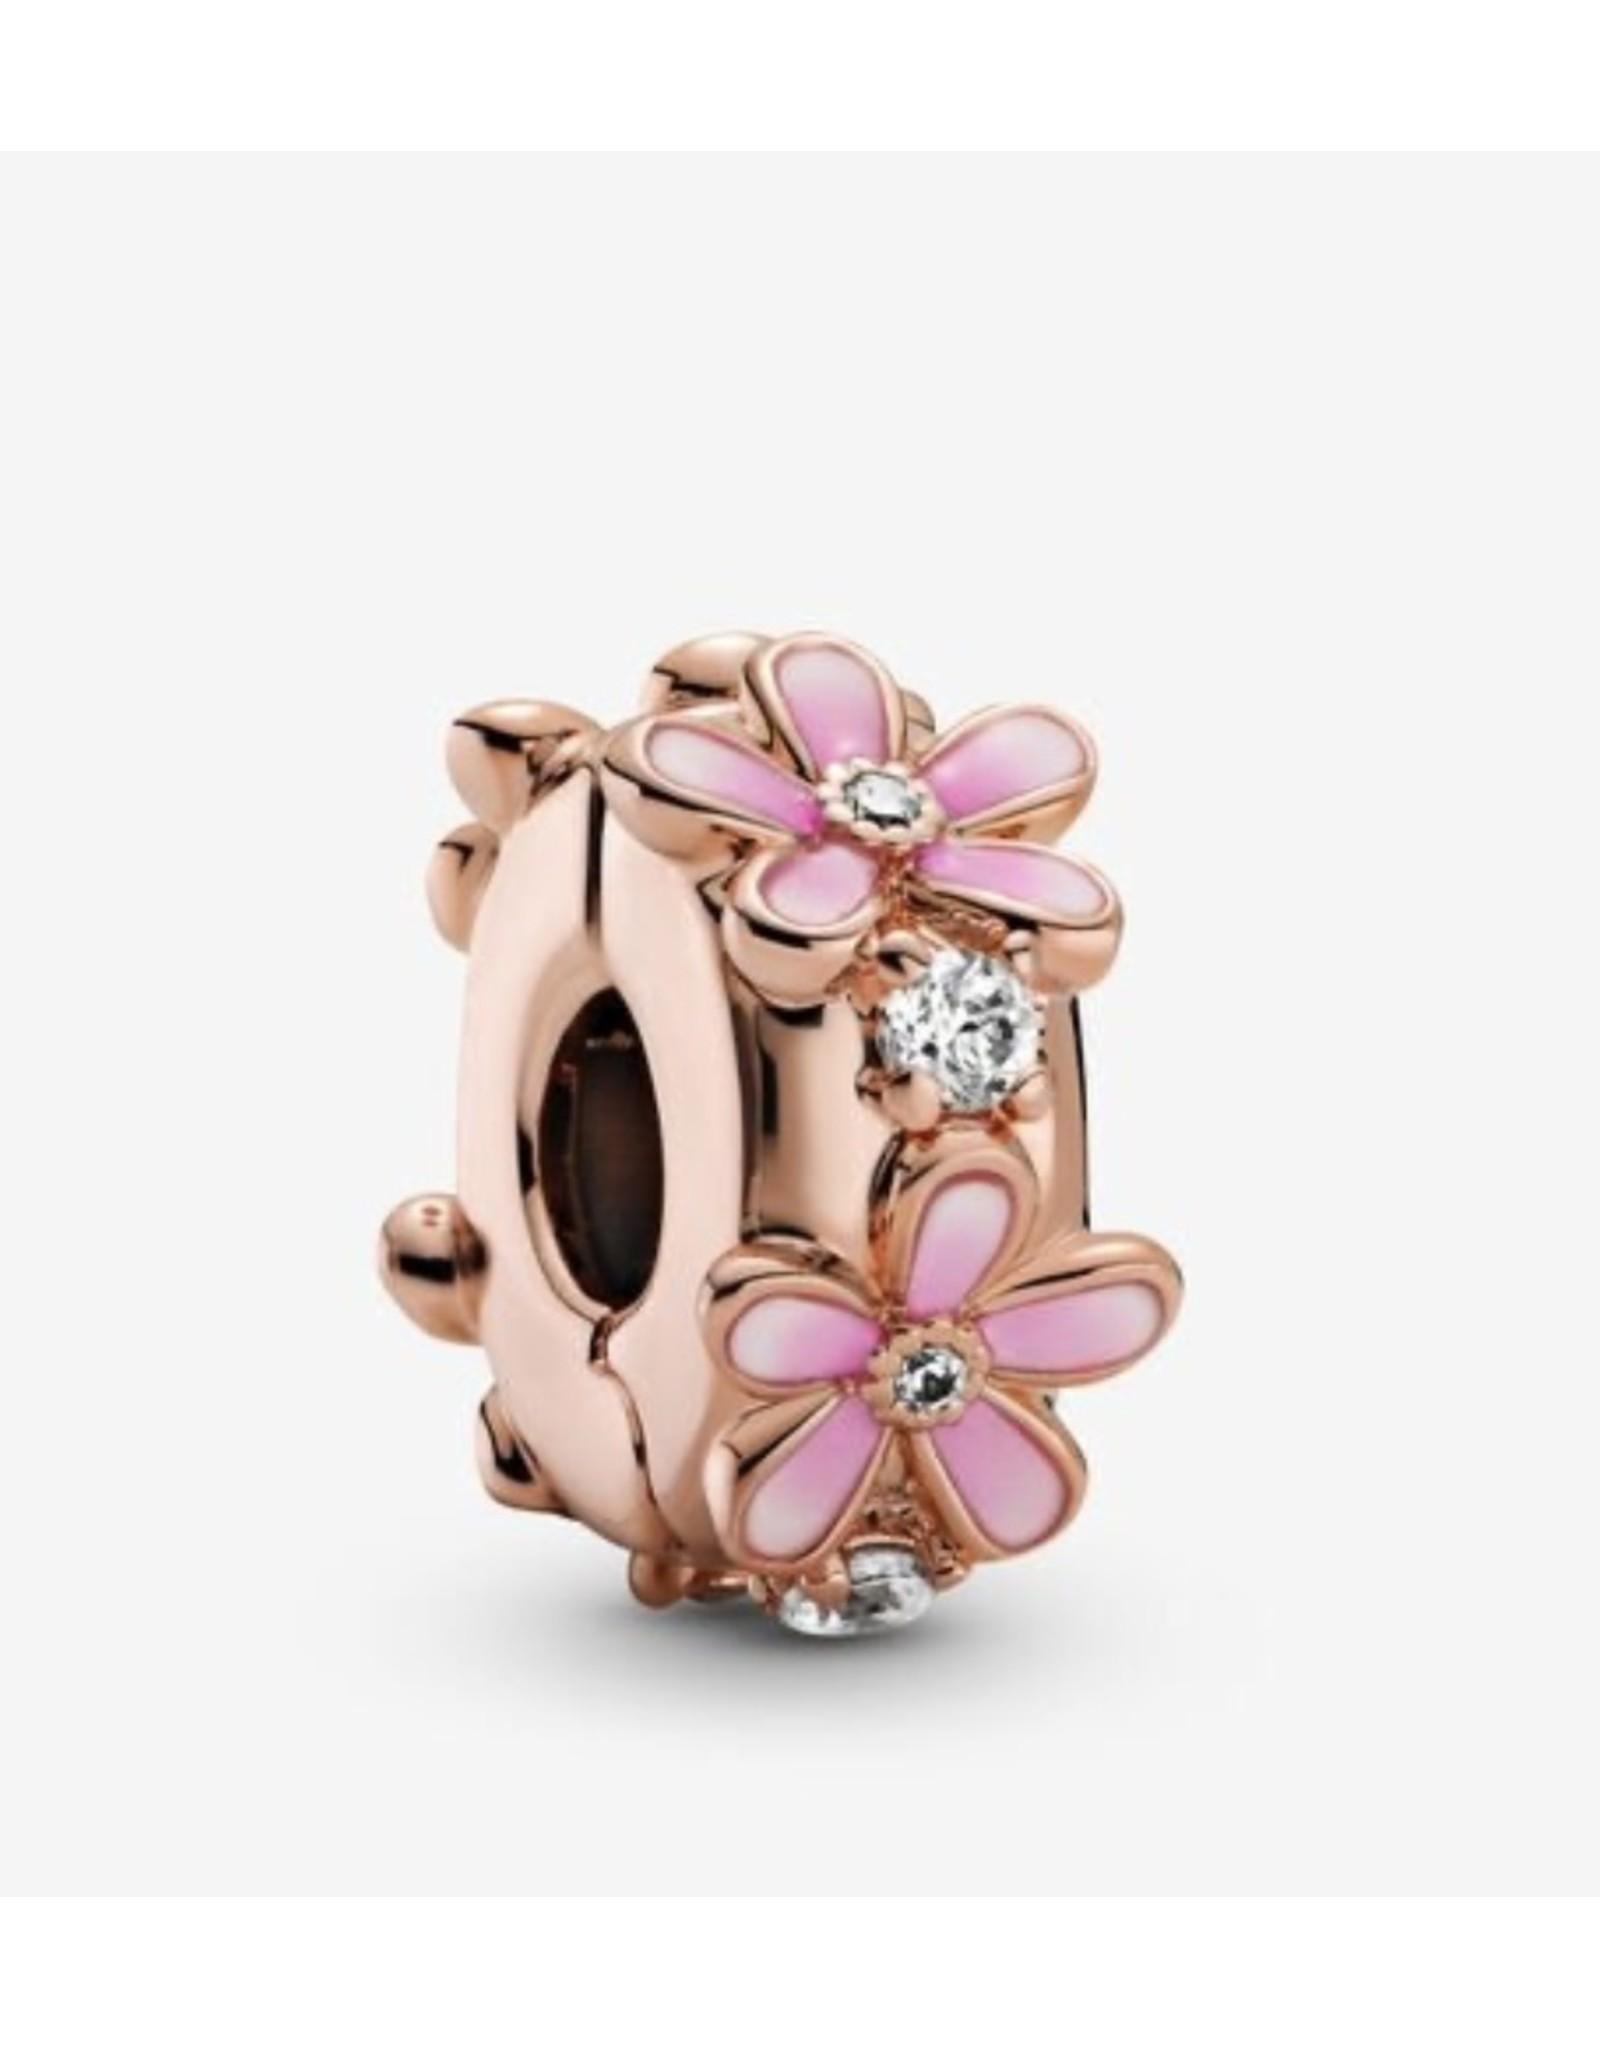 Pandora Pandora Clip, 788809C01, Pink Daisy, Pink Enamel & Clear CZ